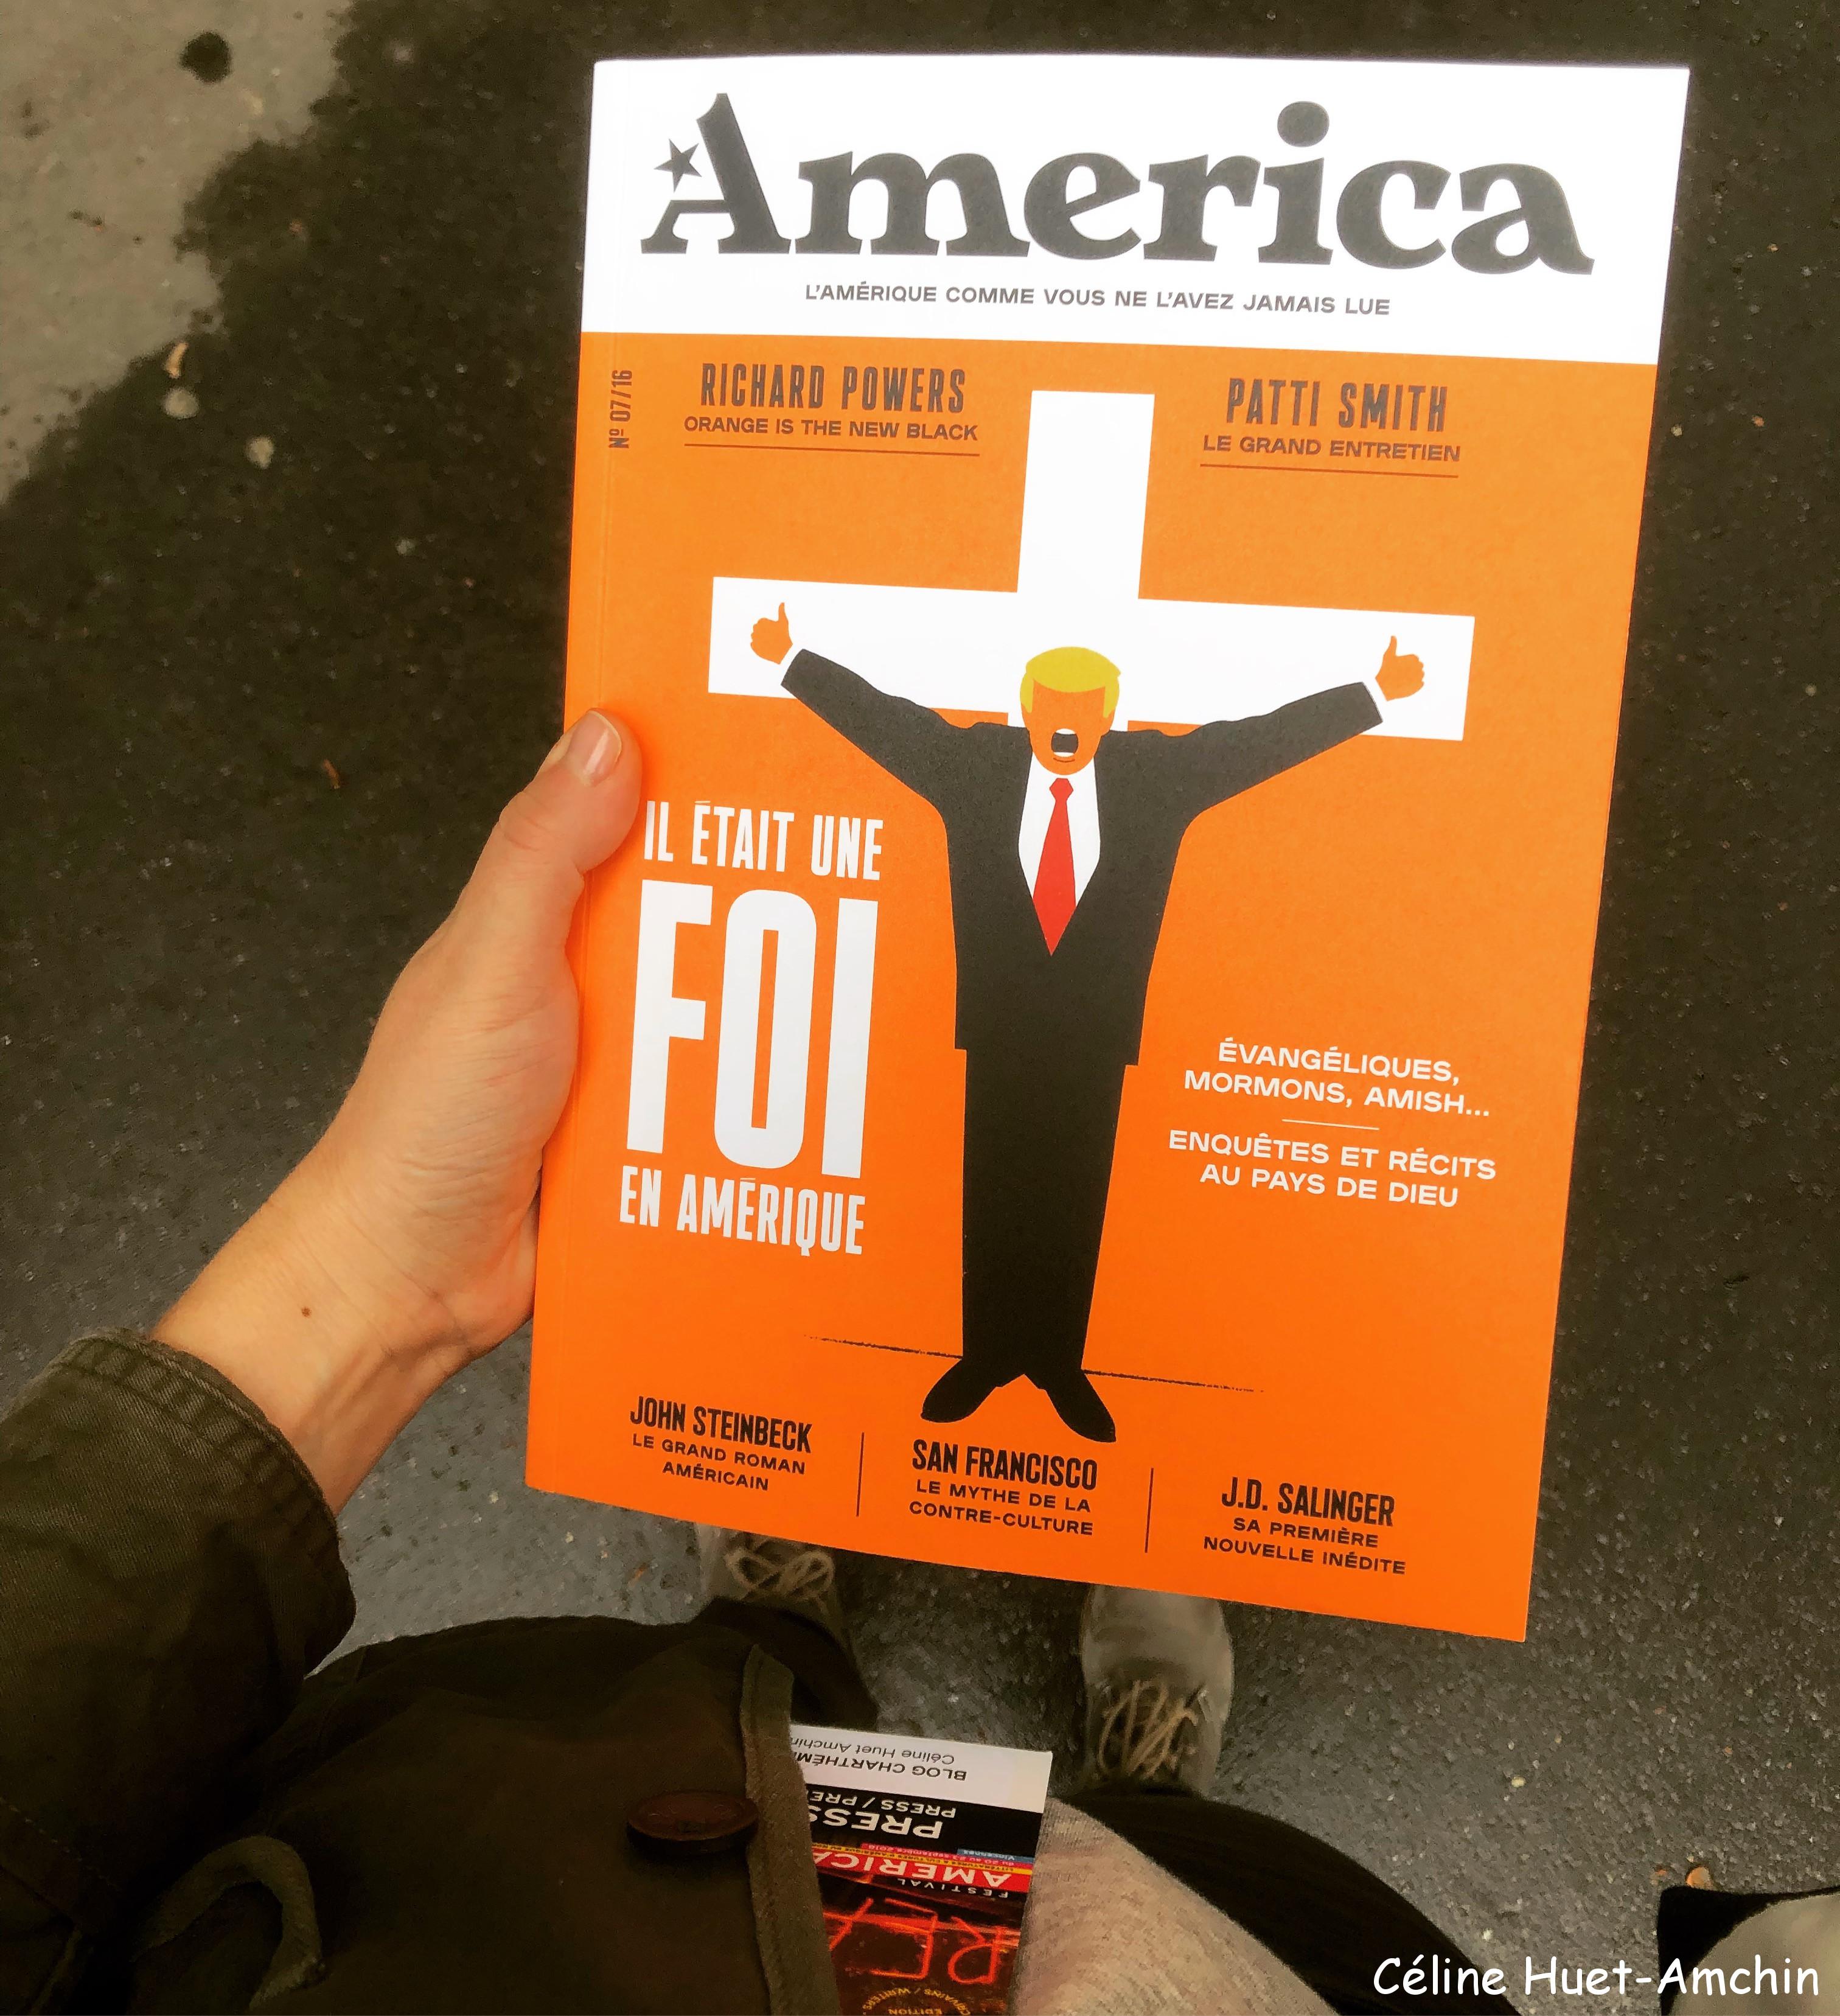 America 7/16 9e édition Festival America Vincennes